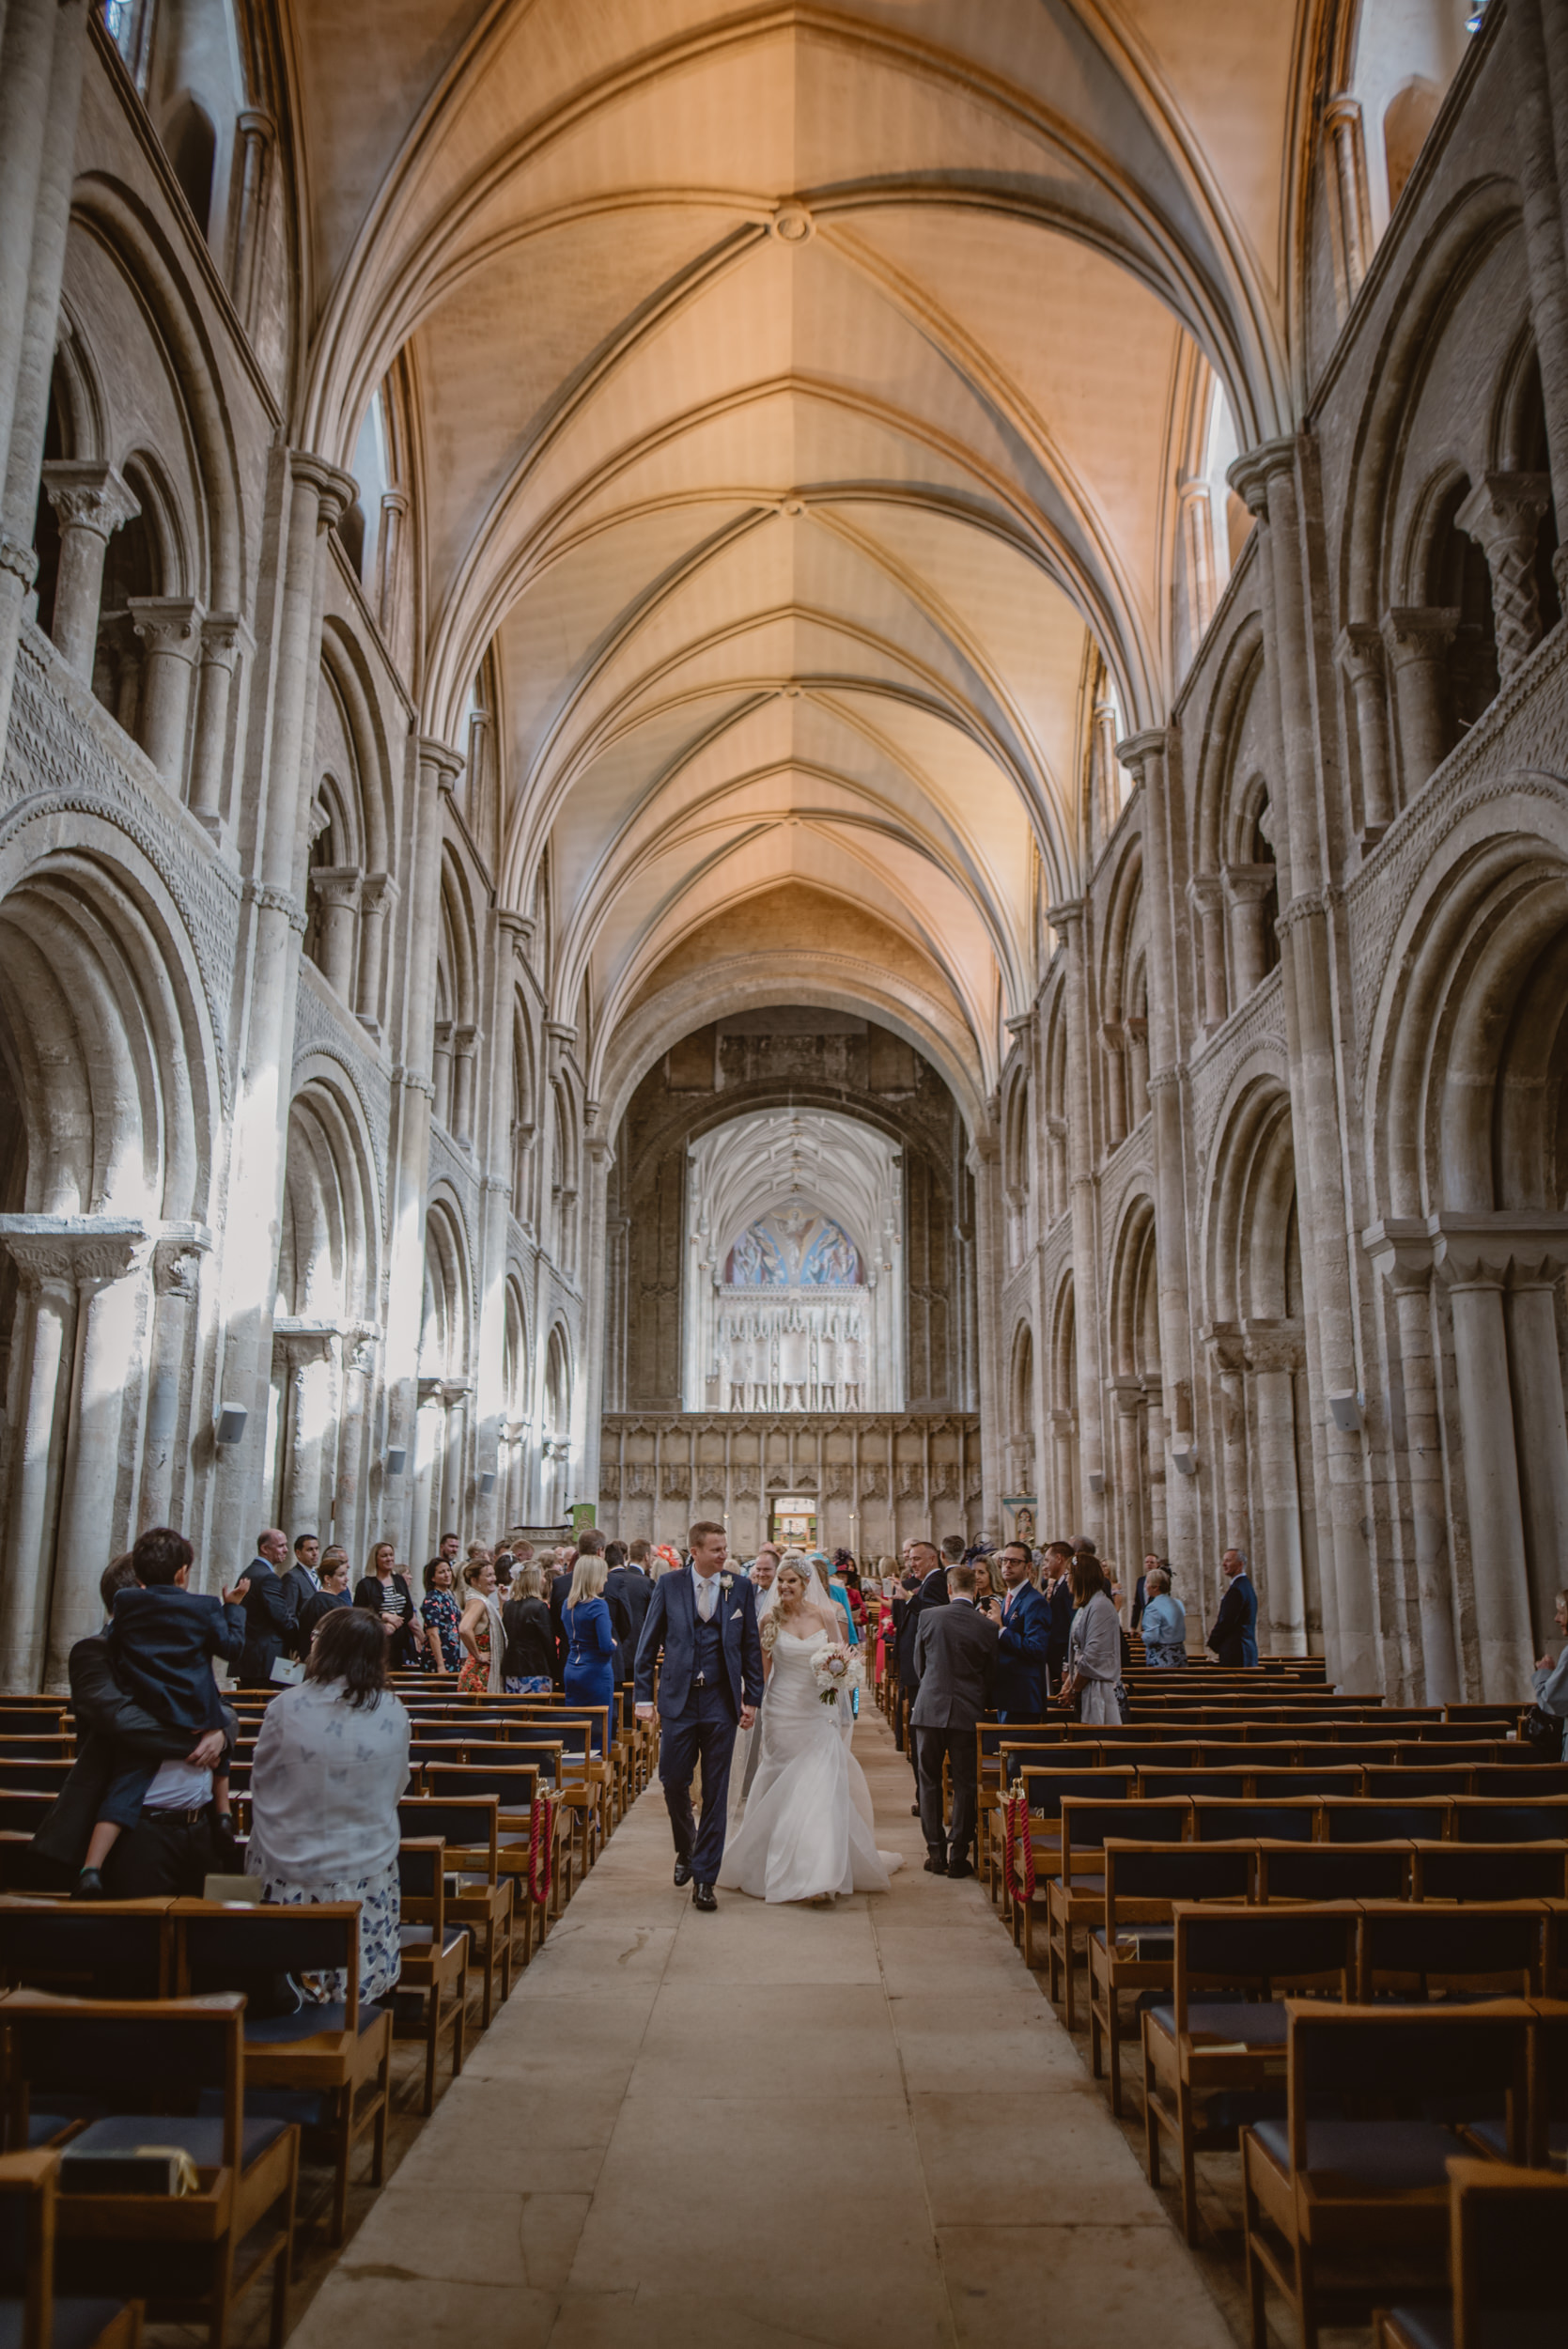 Trisha-and-Roger-wedding-The-Priory-Church-and-Chewton-Glen-Hotel-Christchurch-Manu-Mendoza-Wedding-Photography-196.jpg